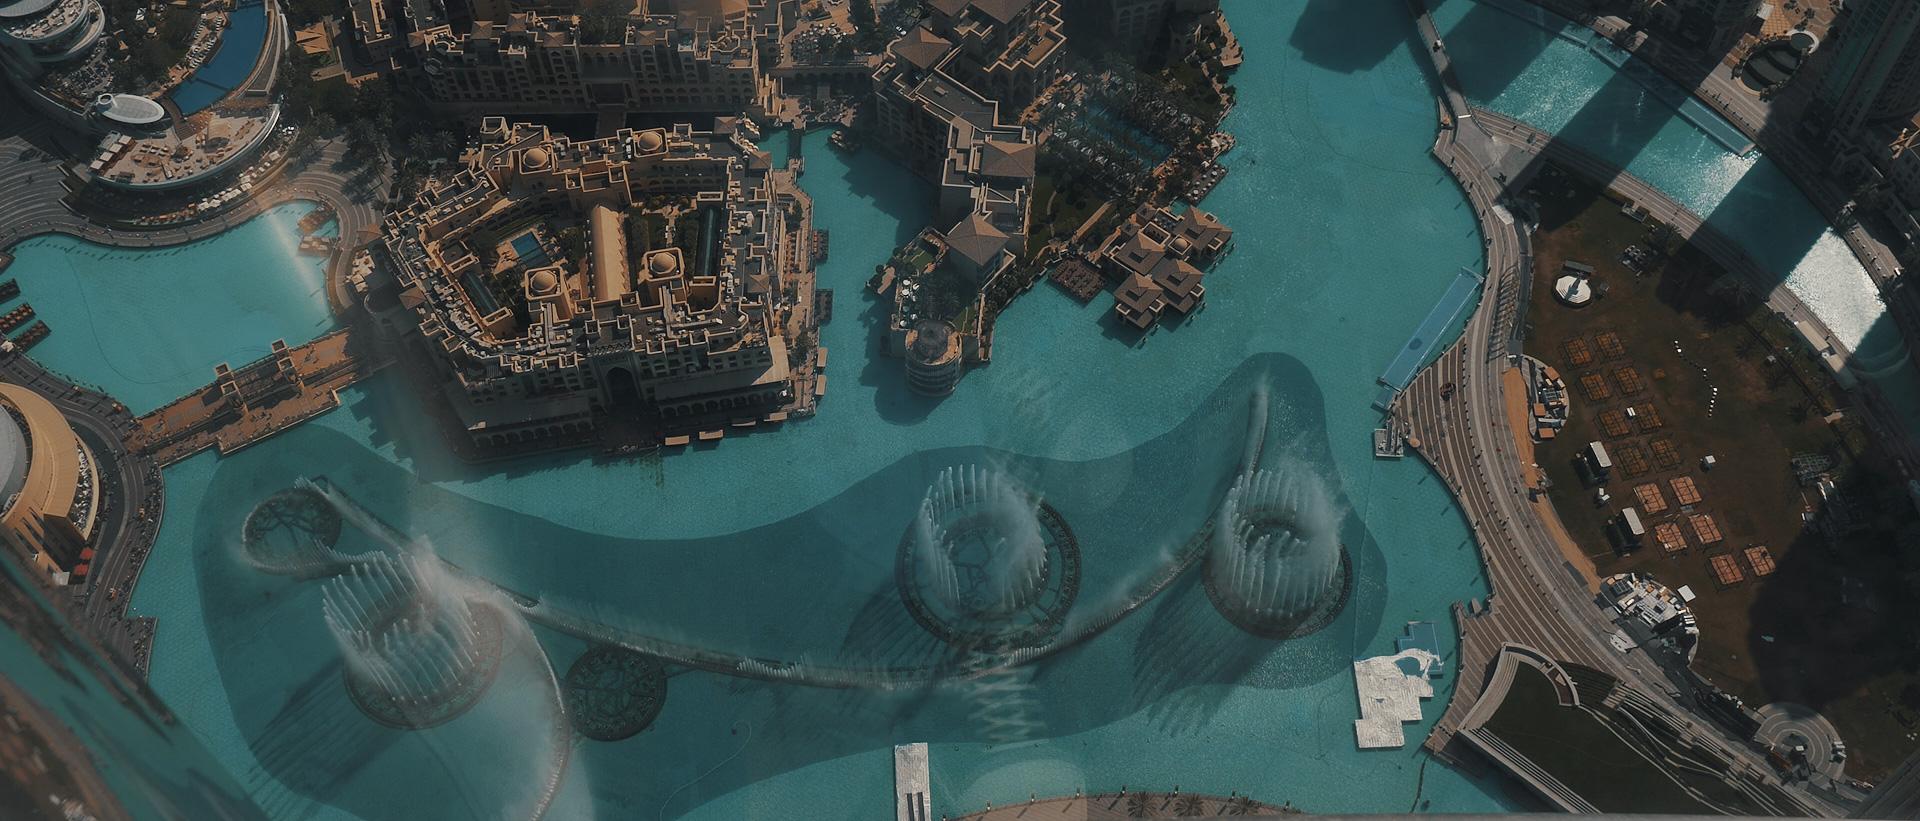 Dubai_08.jpg